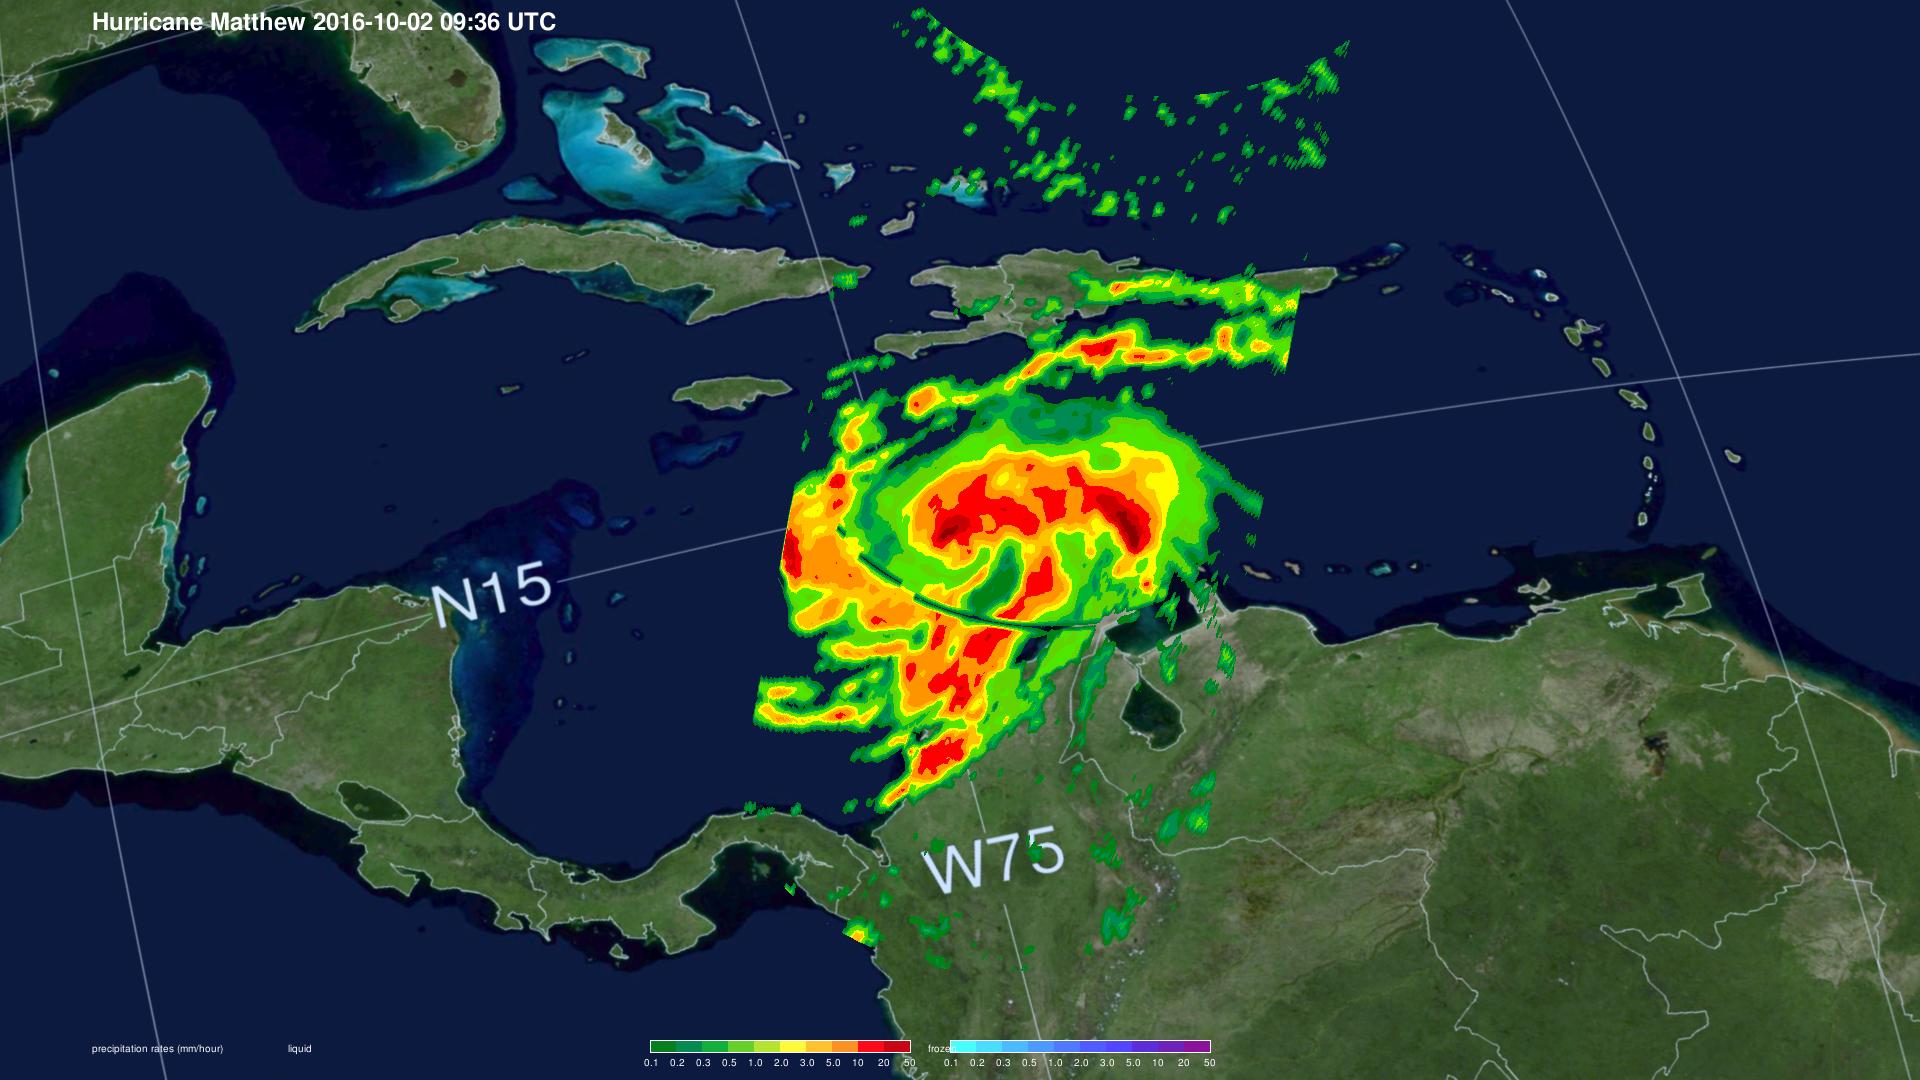 GPM Sees Hurricane Matthew Producing Dangerous Rainfall